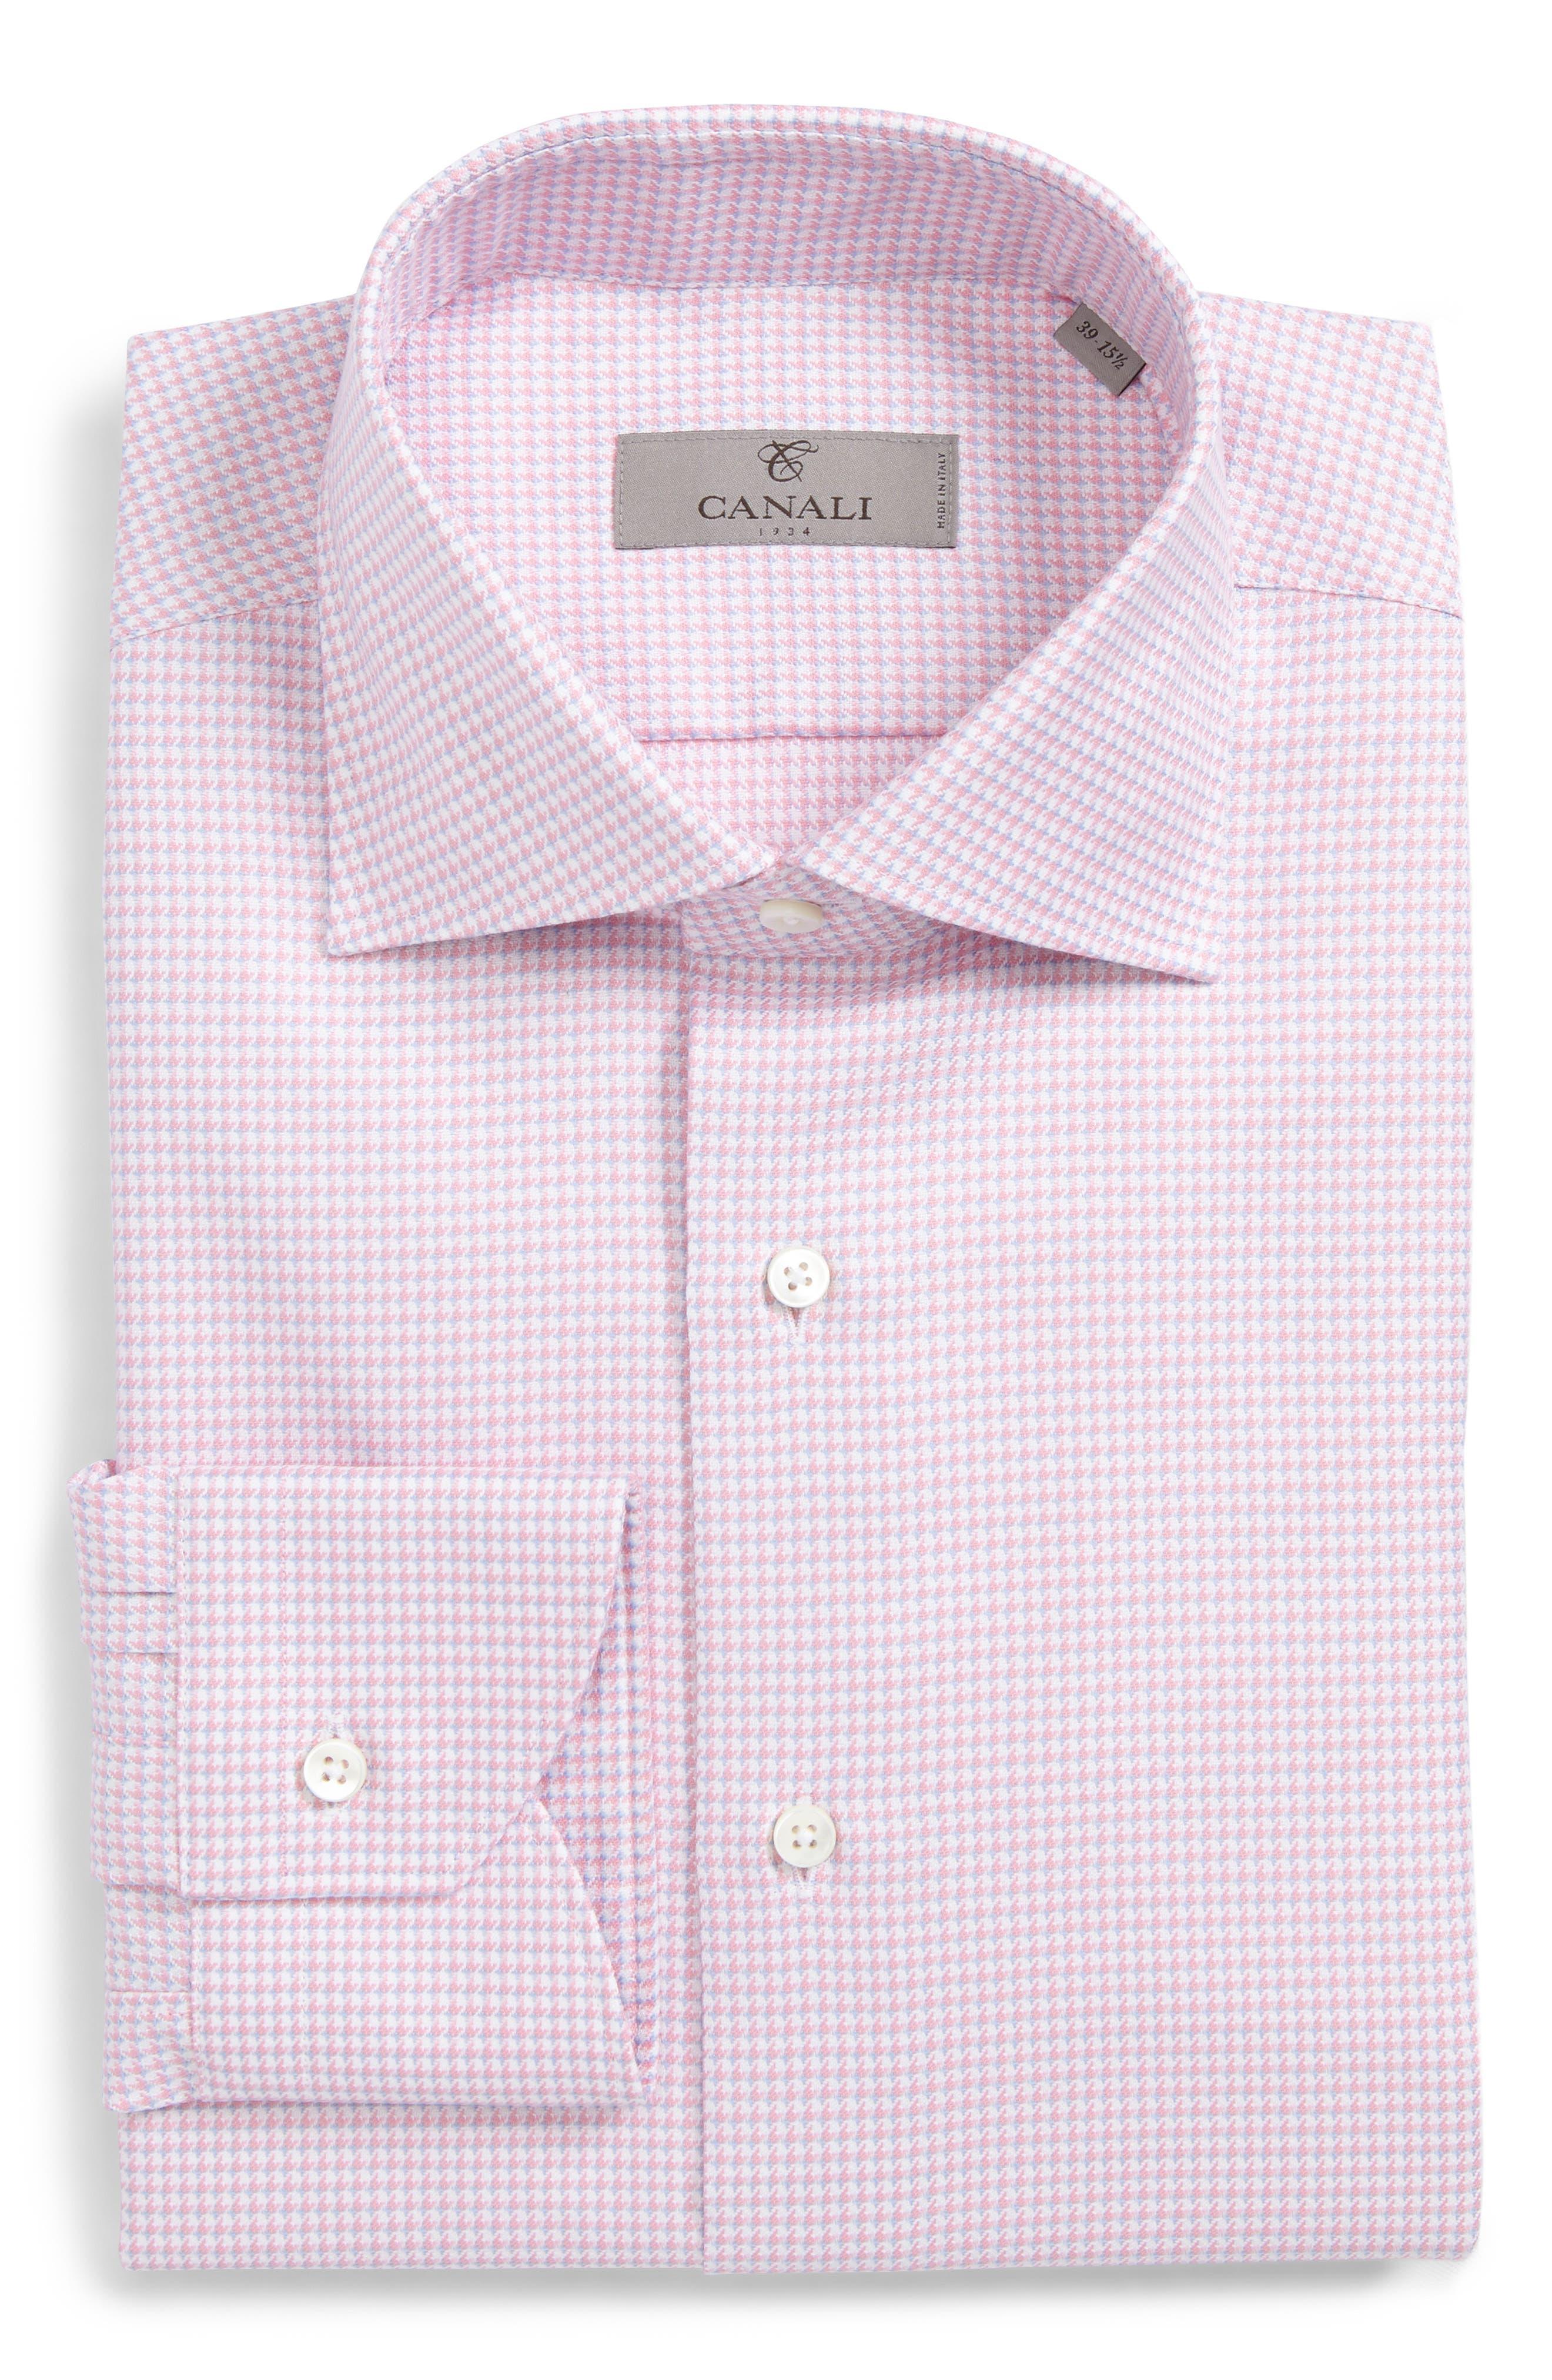 Main Image - Canali Regular Fit Houndstooth Dress Shirt